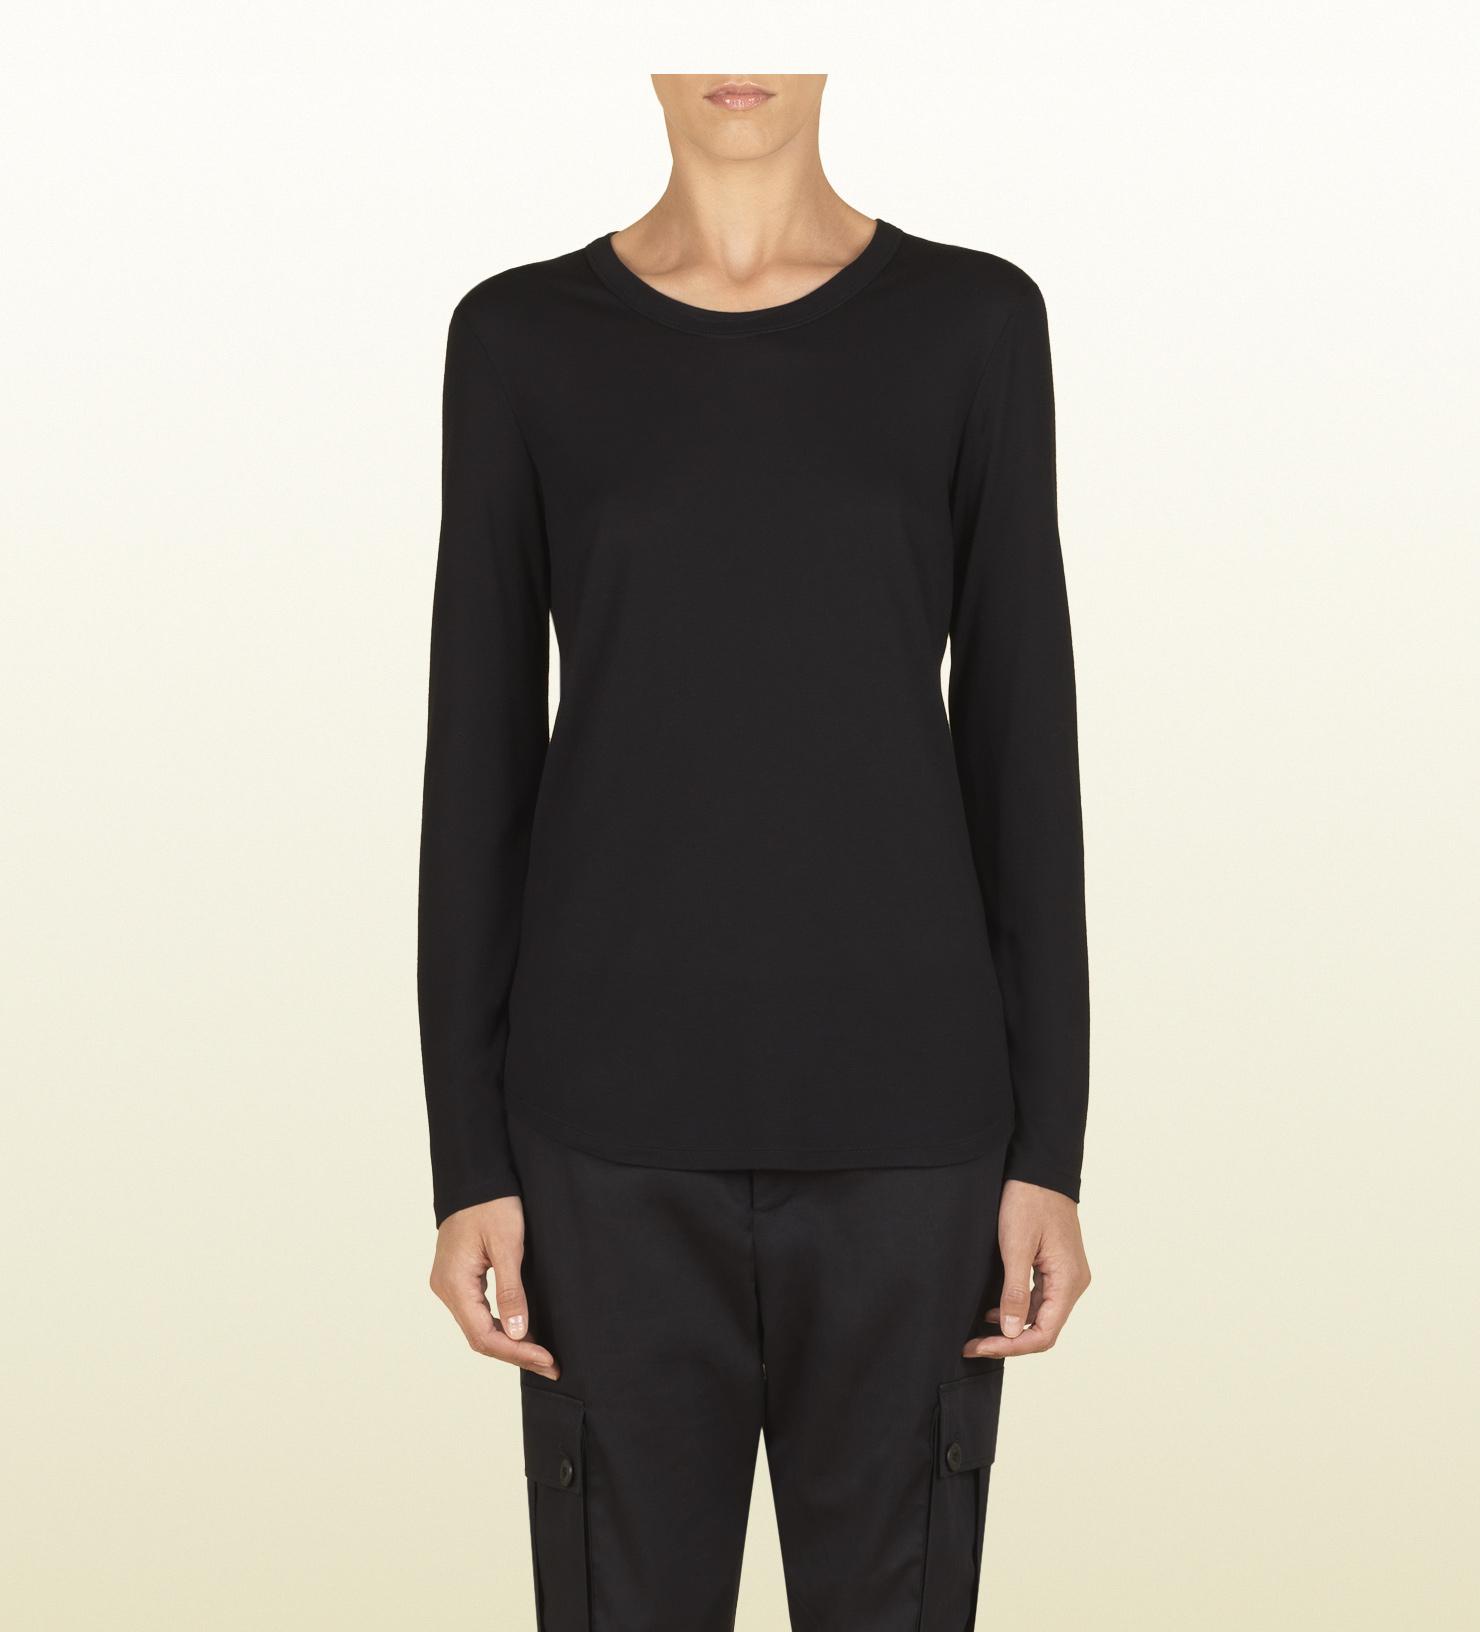 e42acd3d Gucci Women's Black Silk Jersey Long Sleeve T-shirt From Viaggio ...